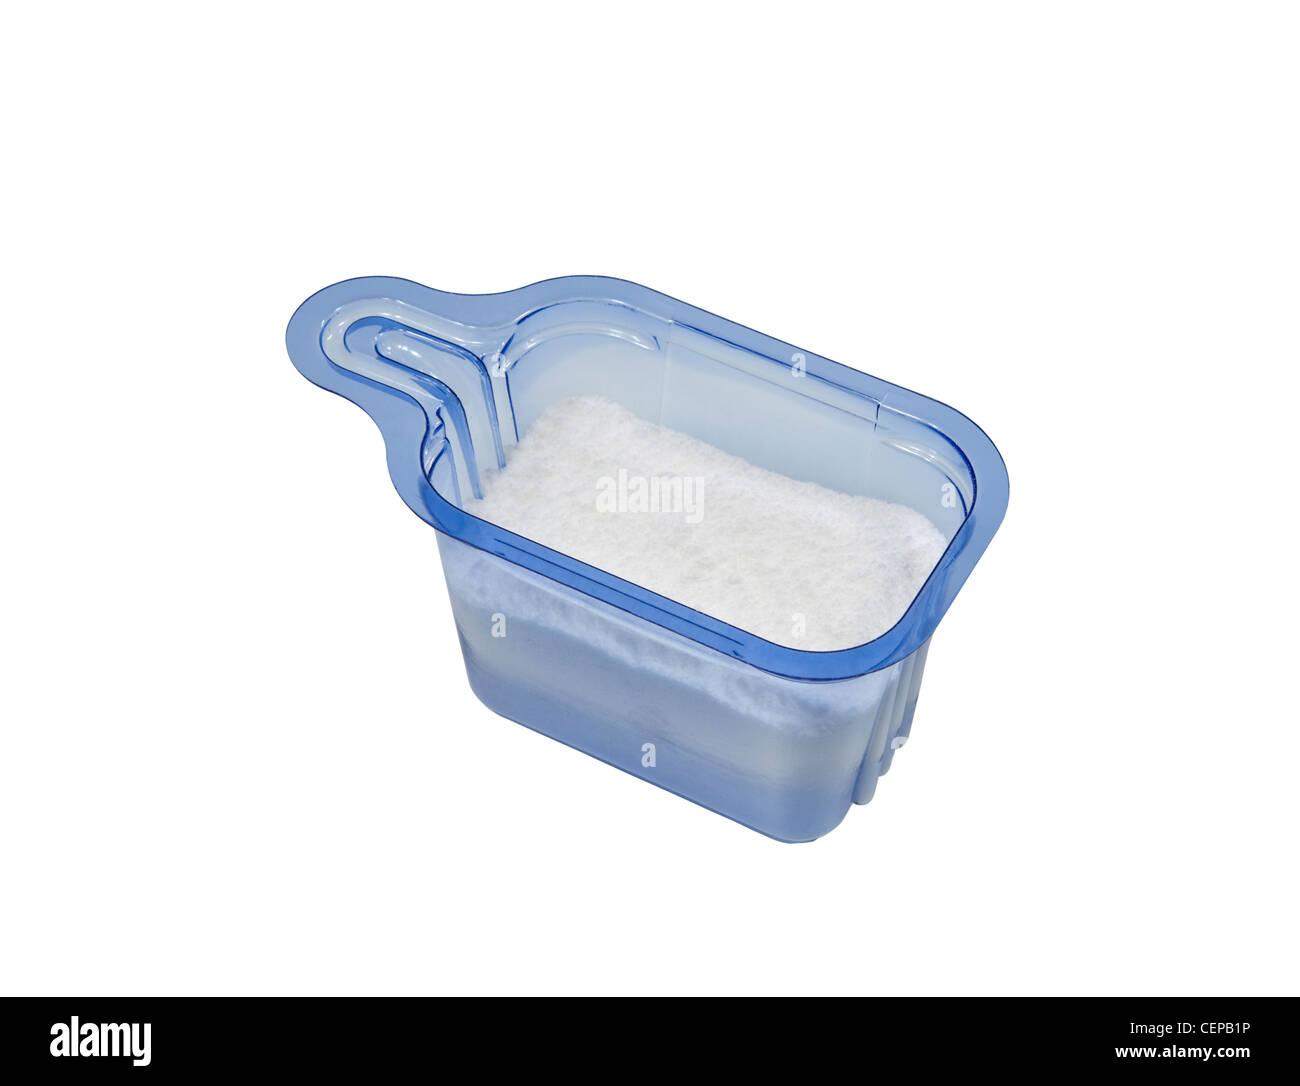 Blue plastic powdered laundry detergent isolated on white. - Stock Image